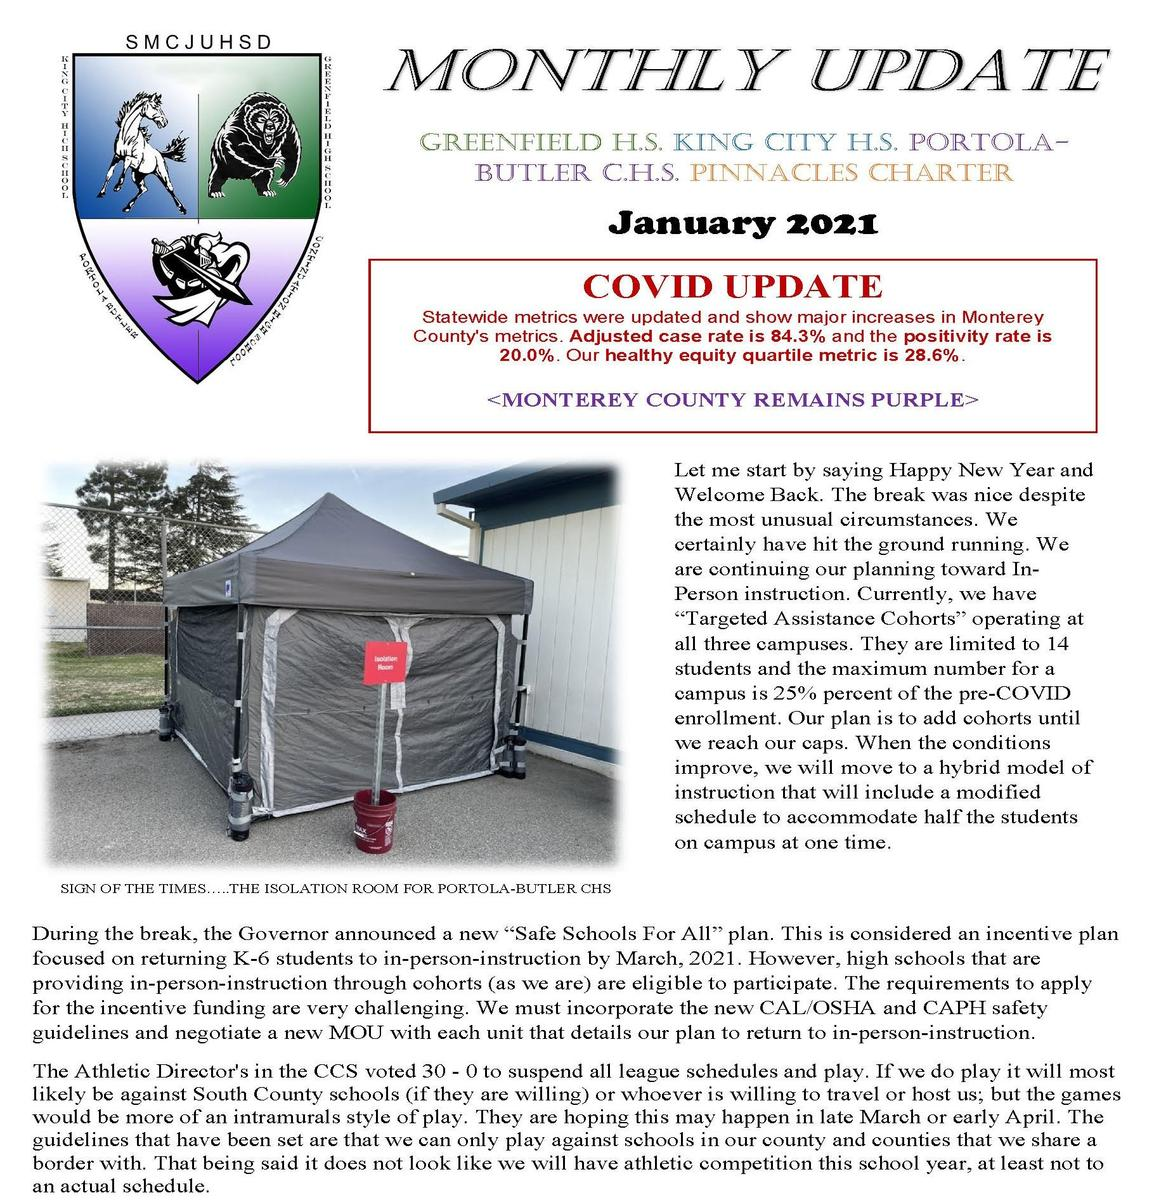 community update part 1